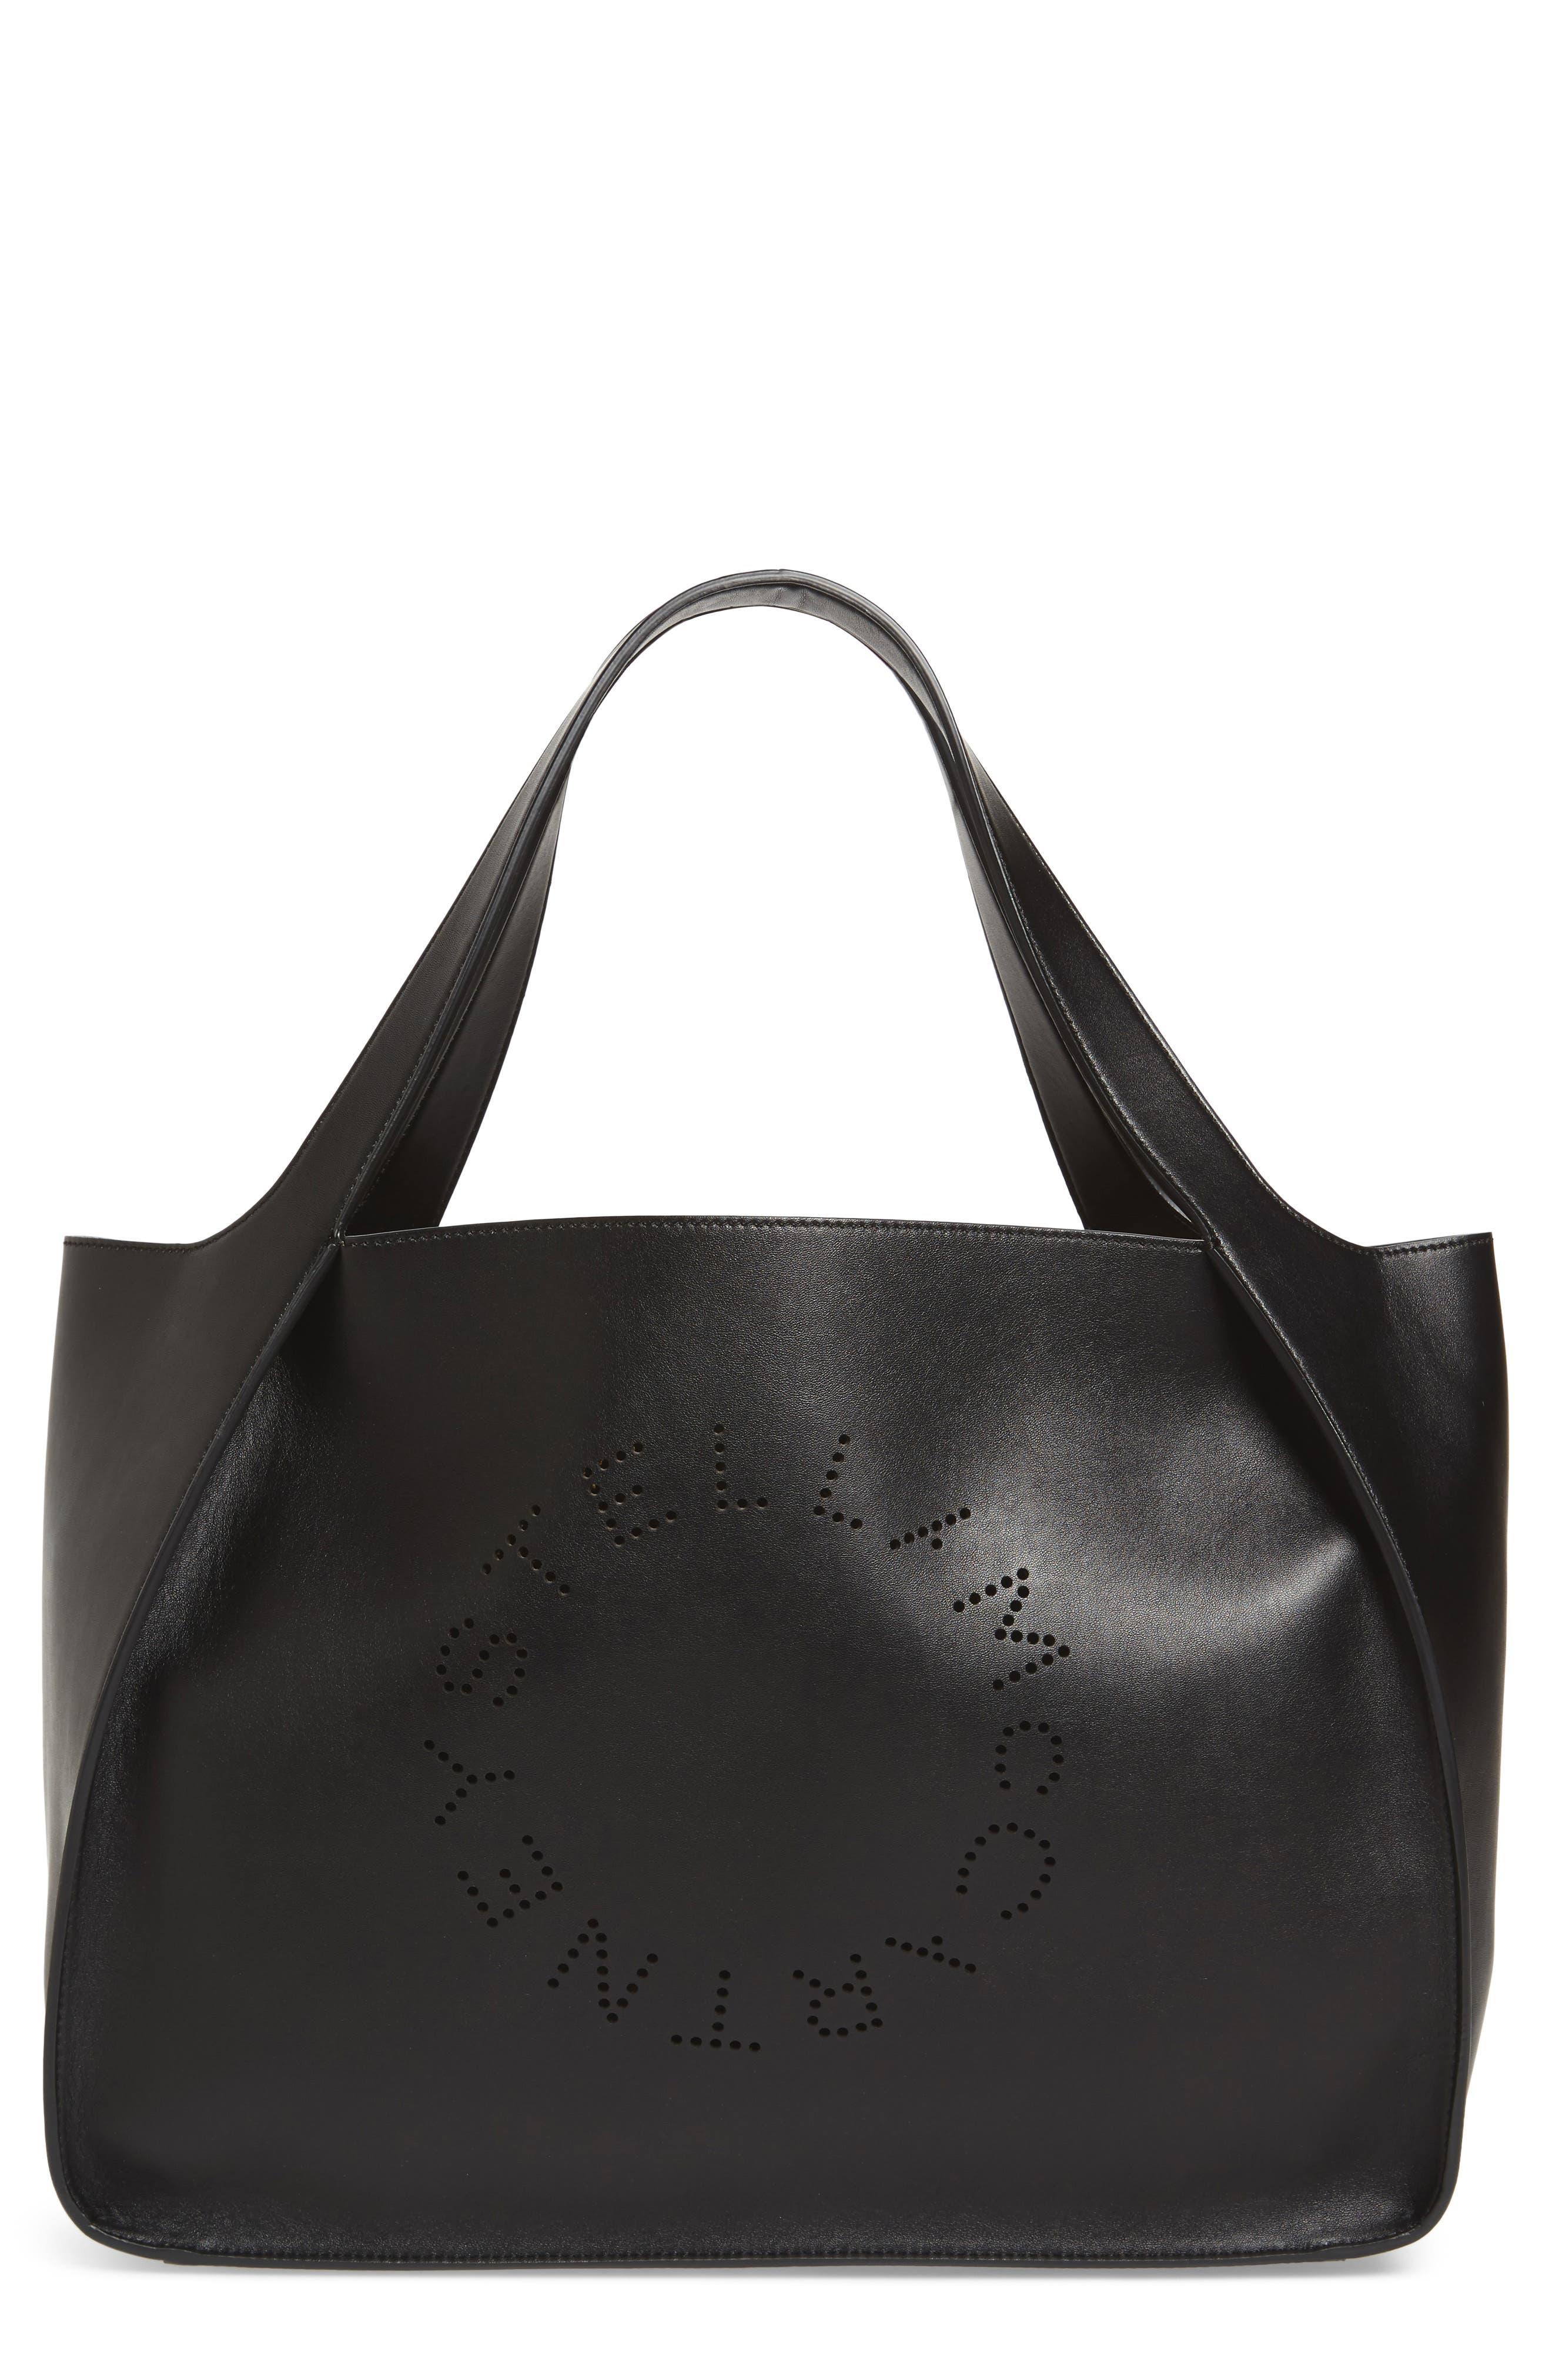 Main Image - Stella McCartney Medium Perforated Logo Faux Leather Tote